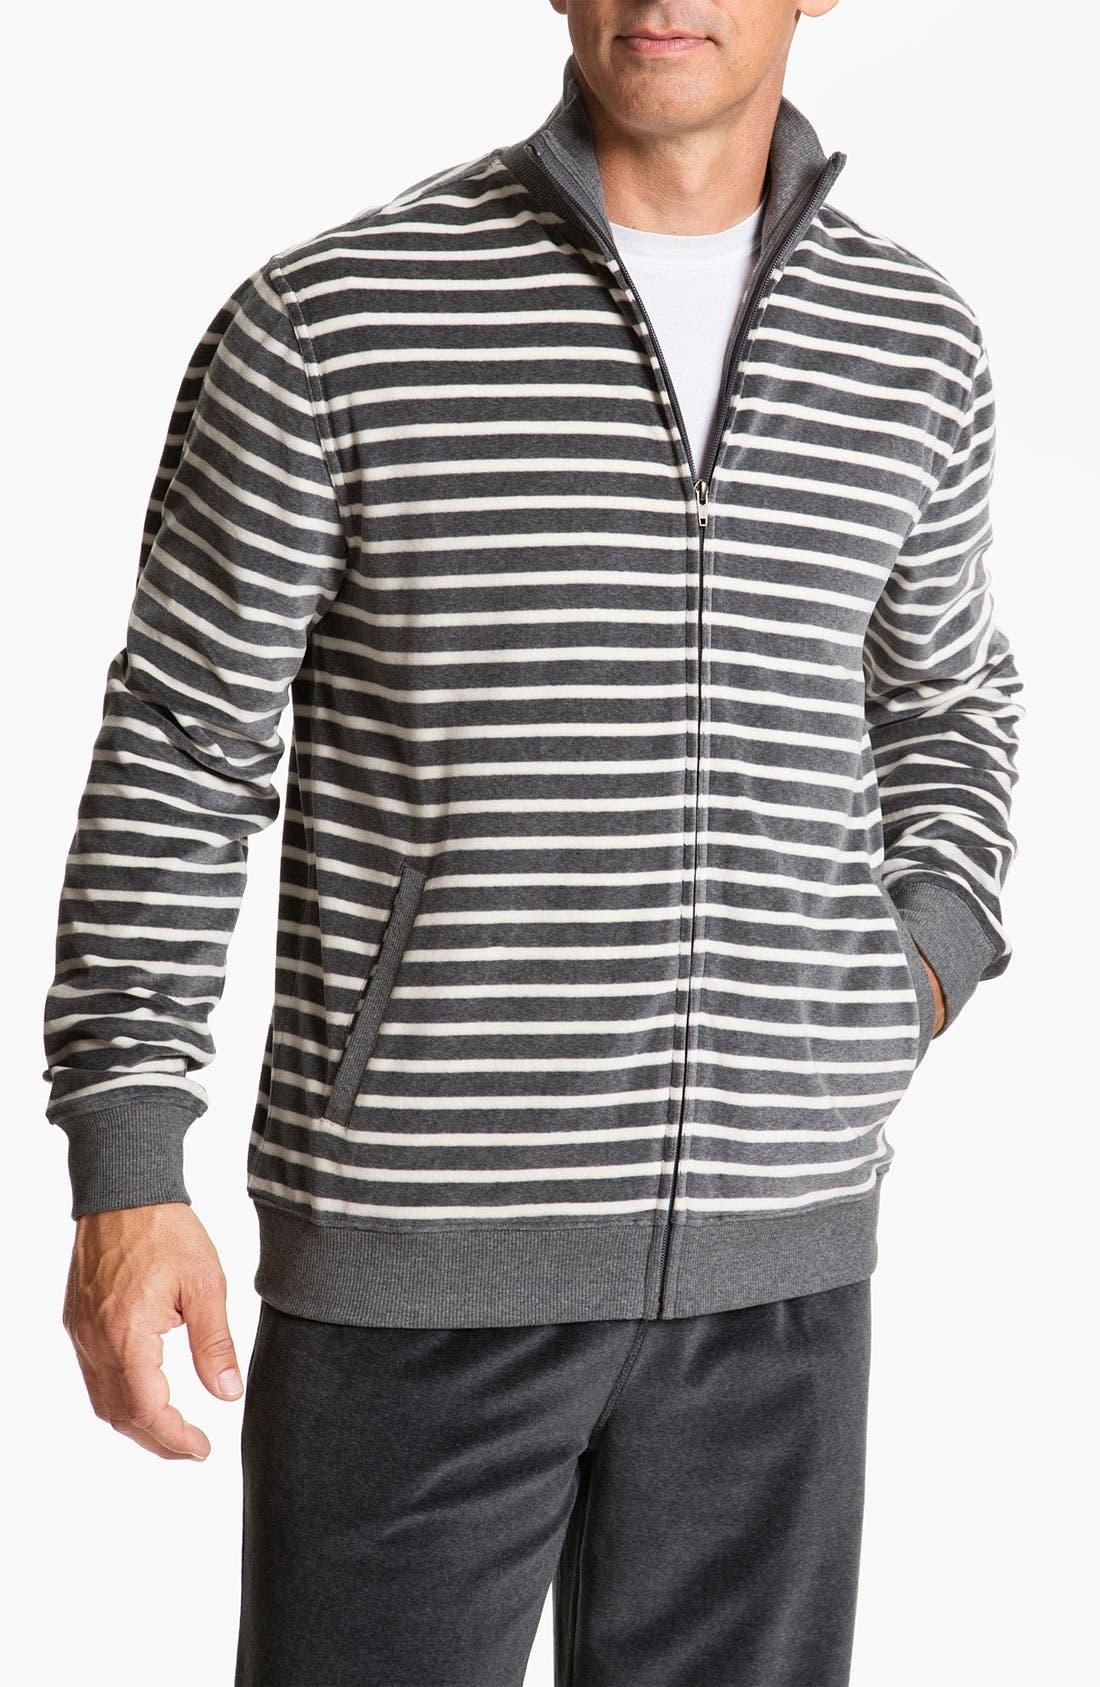 Main Image - Daniel Buchler Yarn-Dyed Stripe Velour Track Jacket